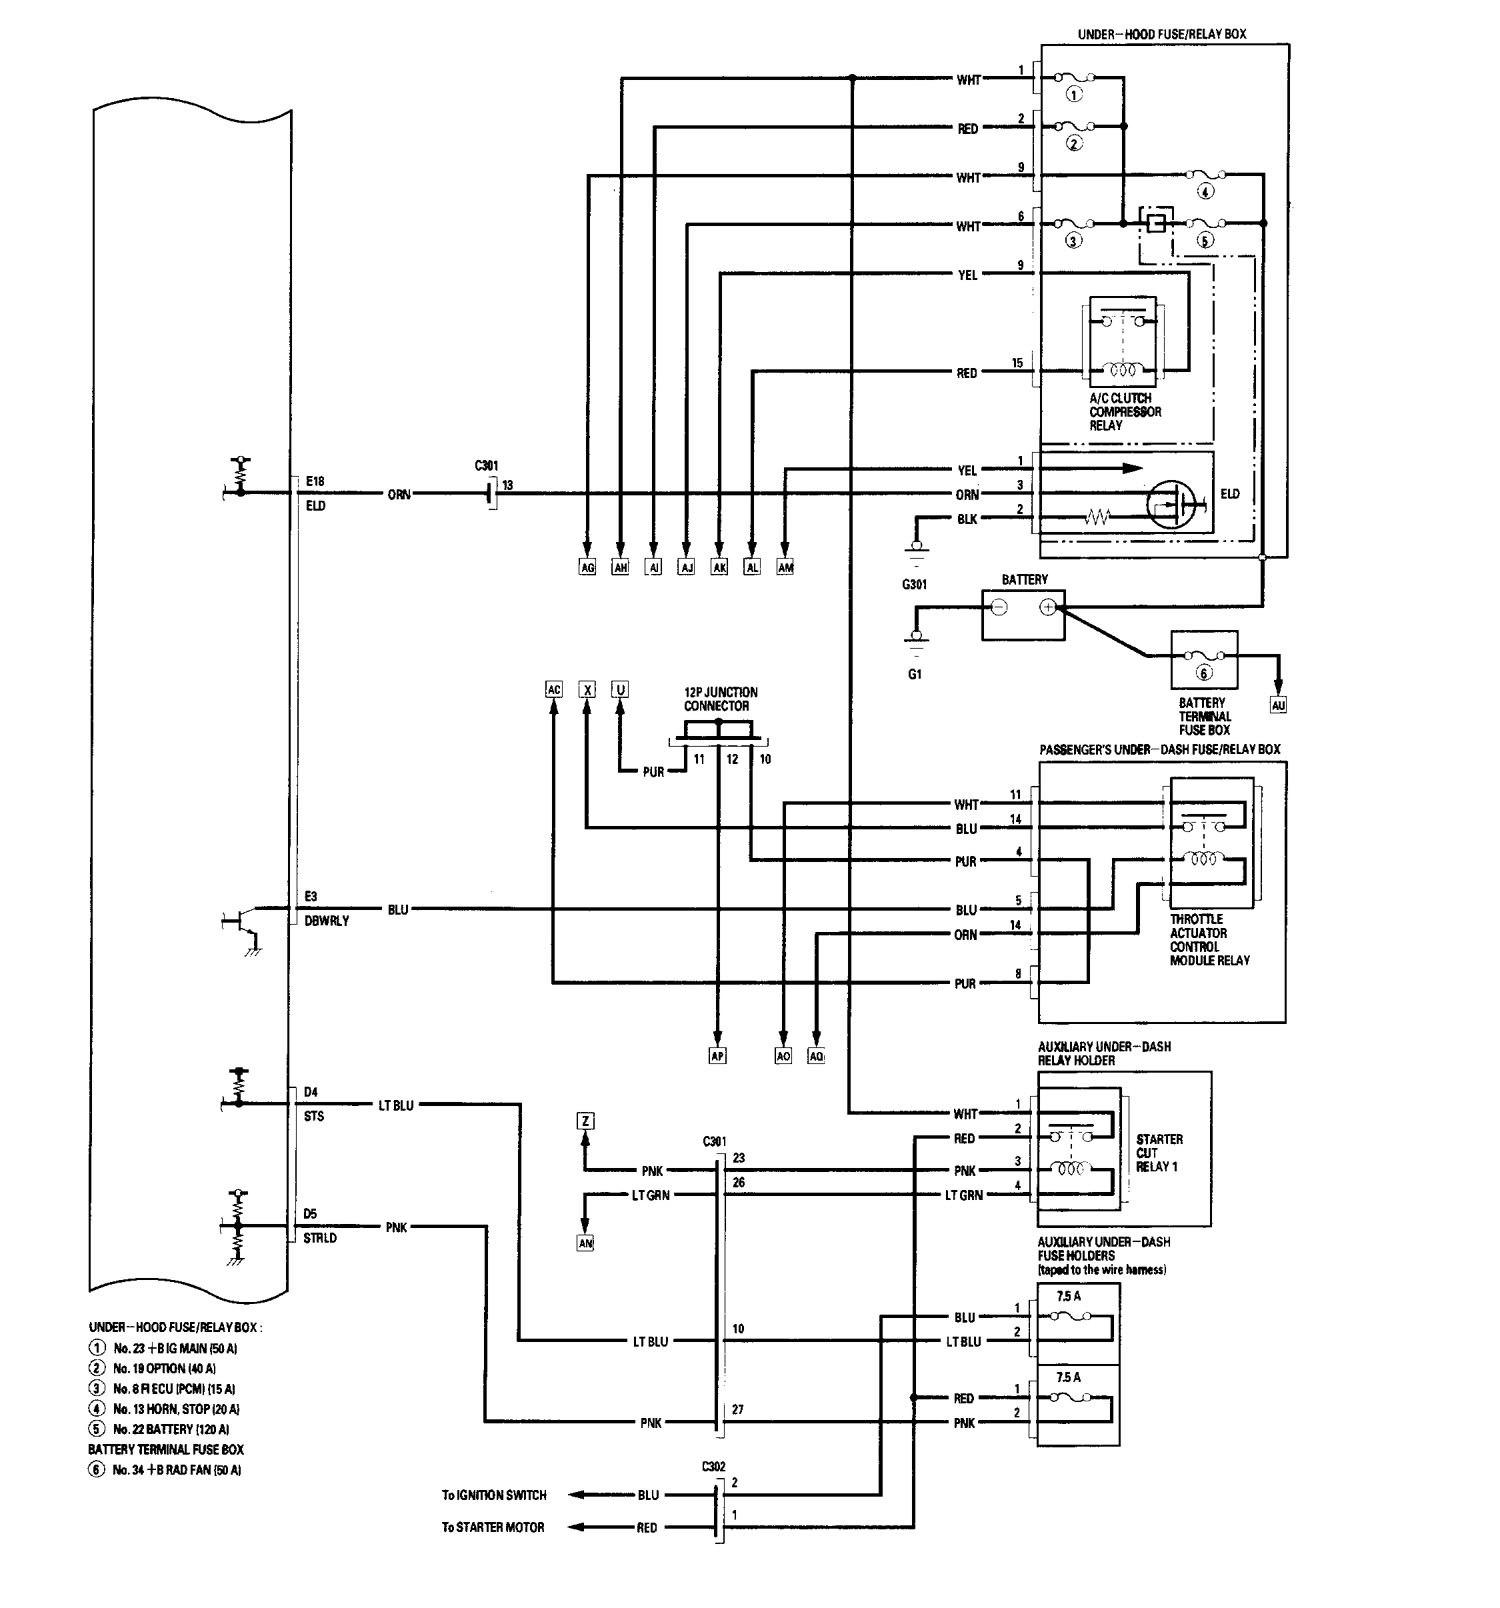 rl fuse diagram 2006 2002 toyota sequoia fuse diagram 1999 Acura RL Specifications 2006 acura rl 35 fuse box diagram wiring diagrams u2022 1999 oldsmobile silhouette fuse box